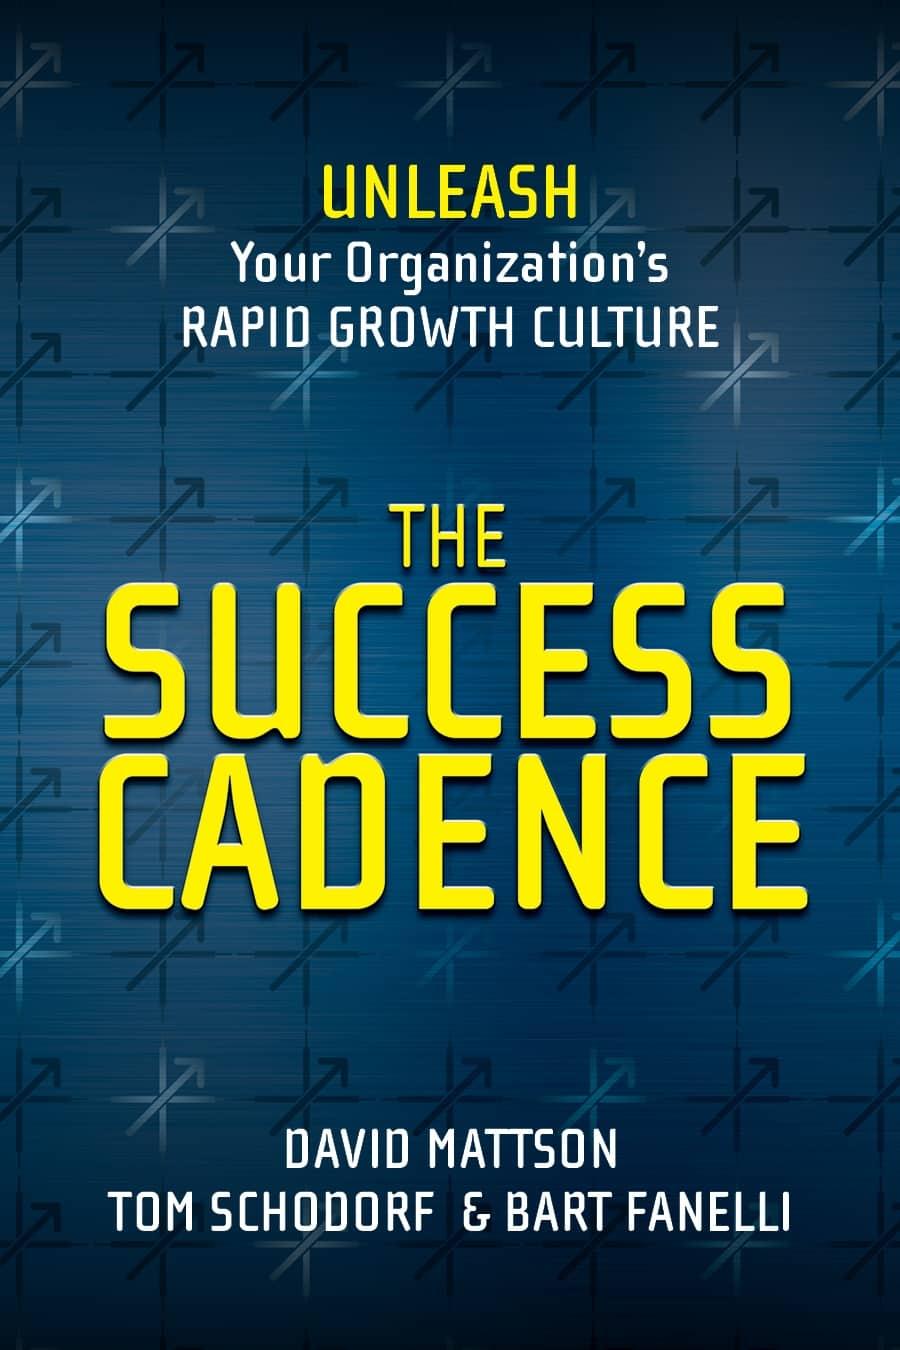 The Success Cadence